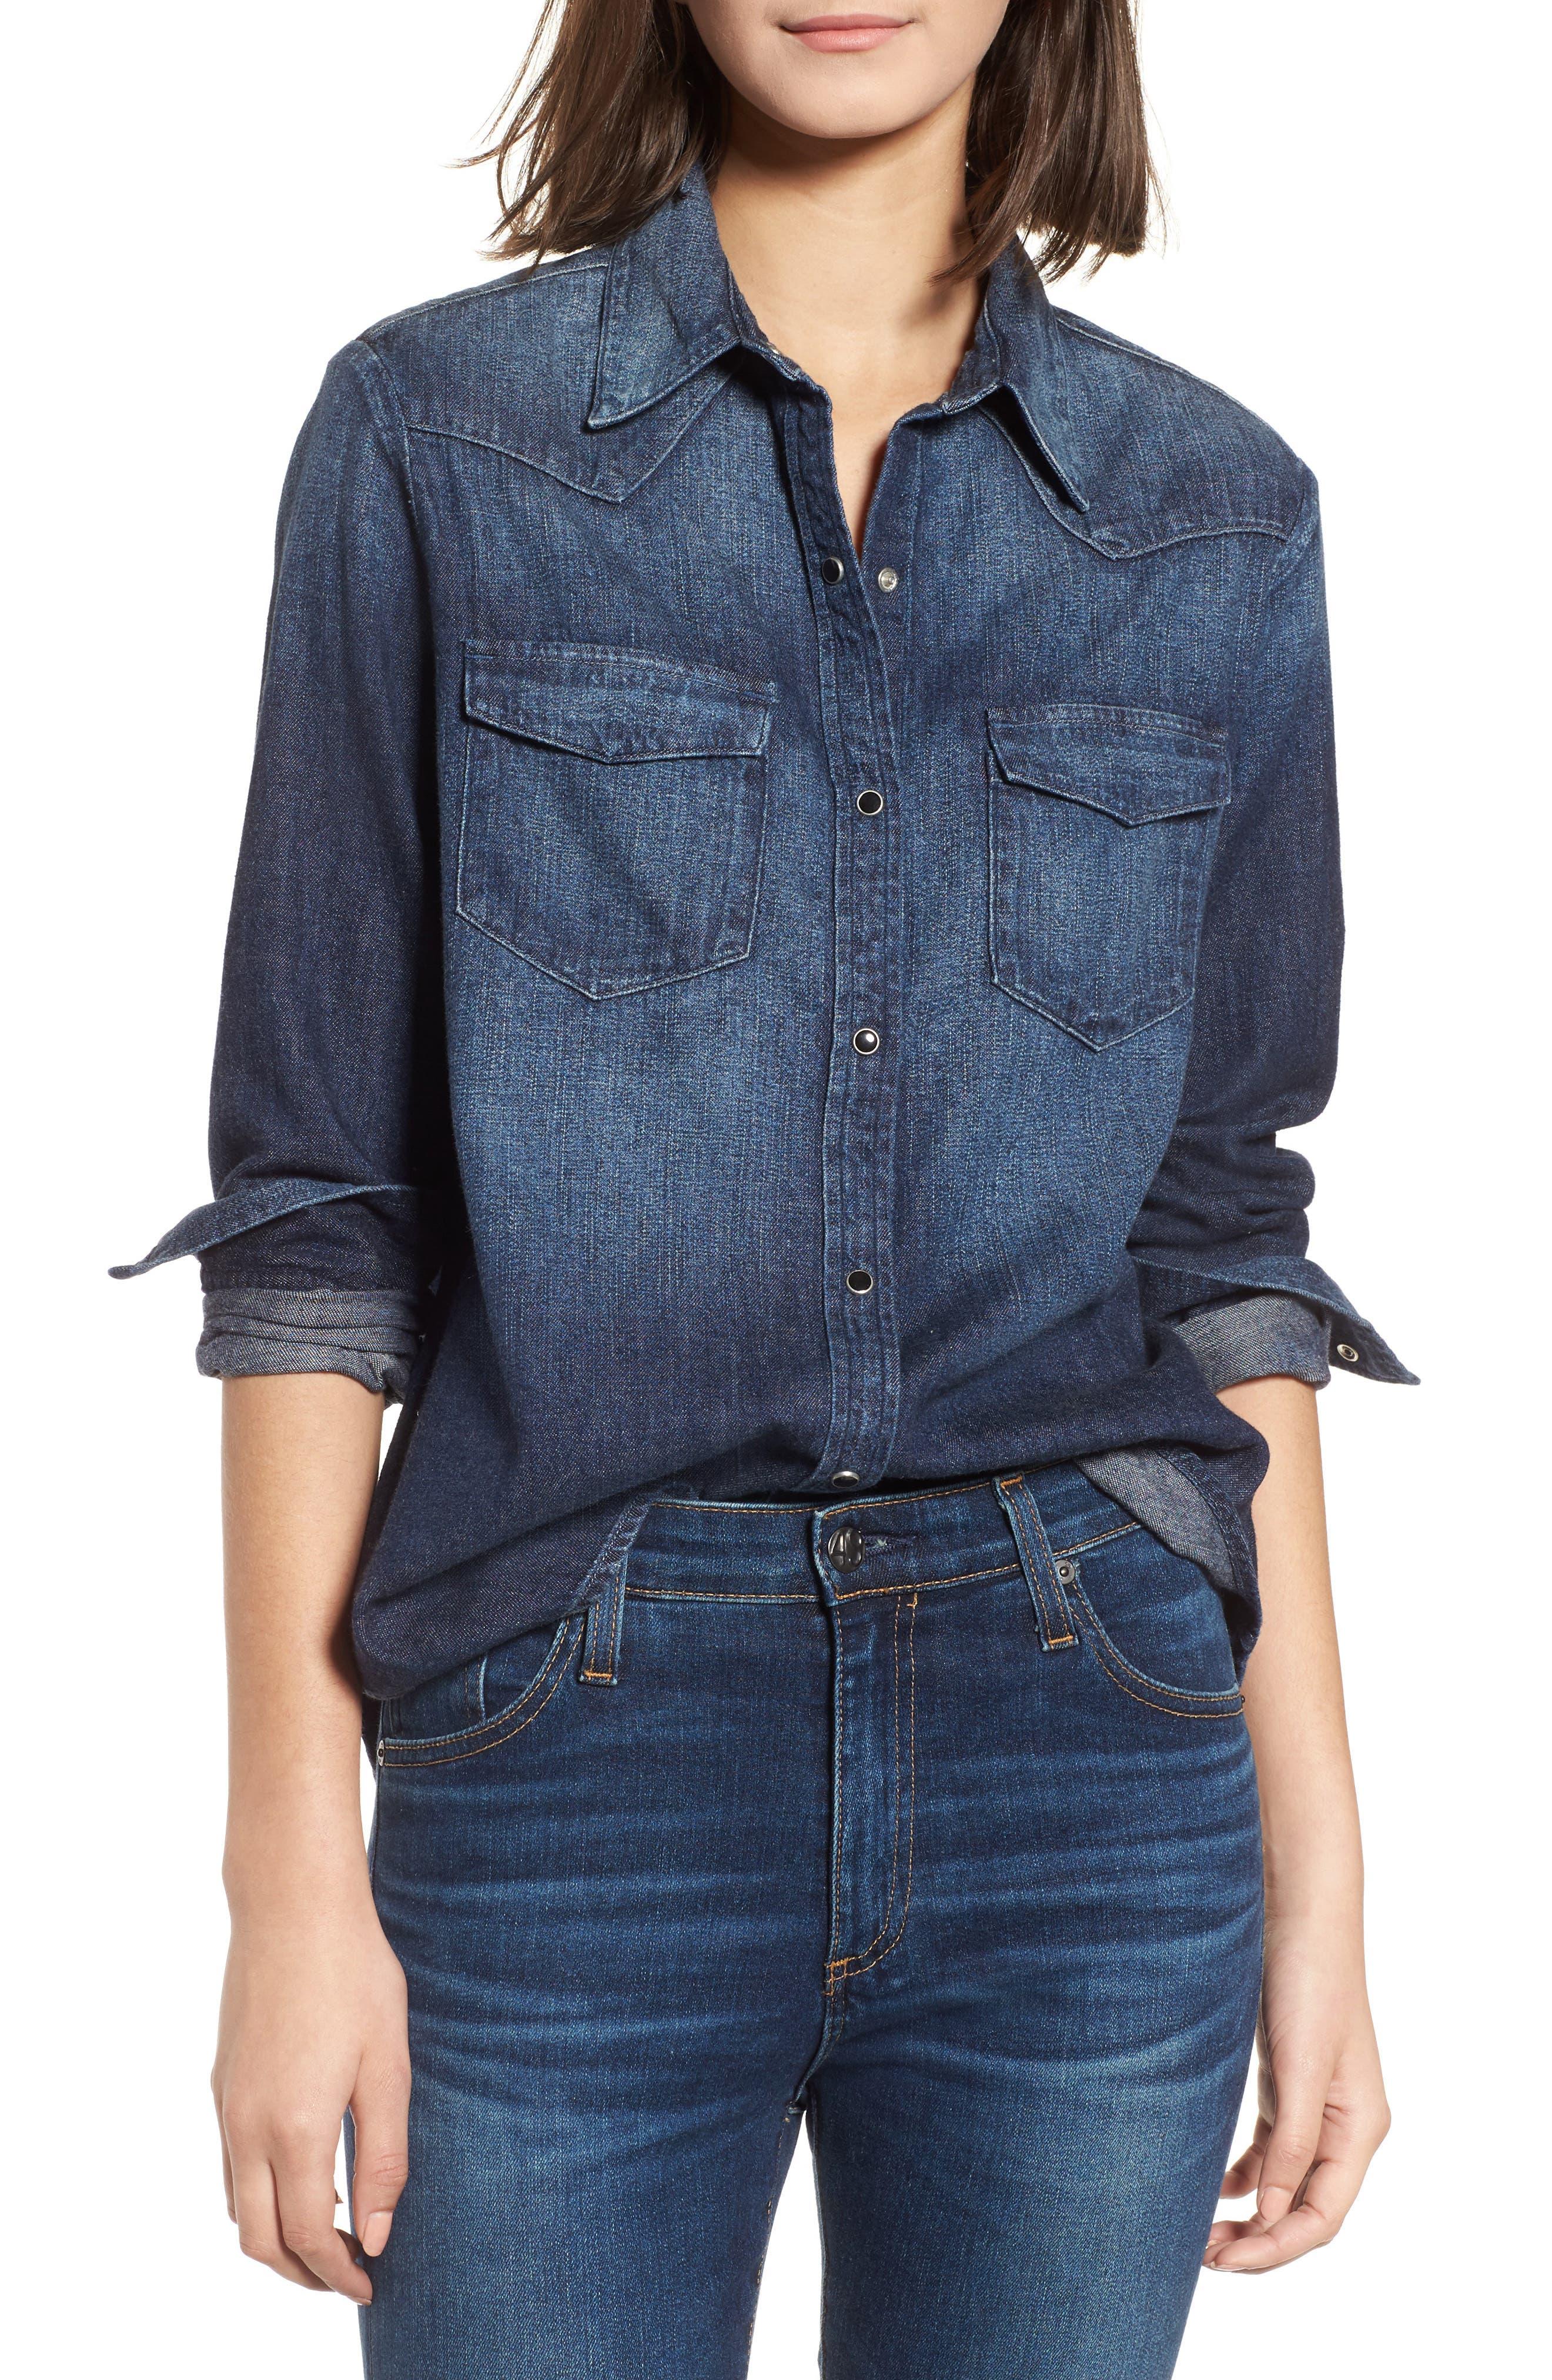 Deanna Denim Shirt,                         Main,                         color, 424